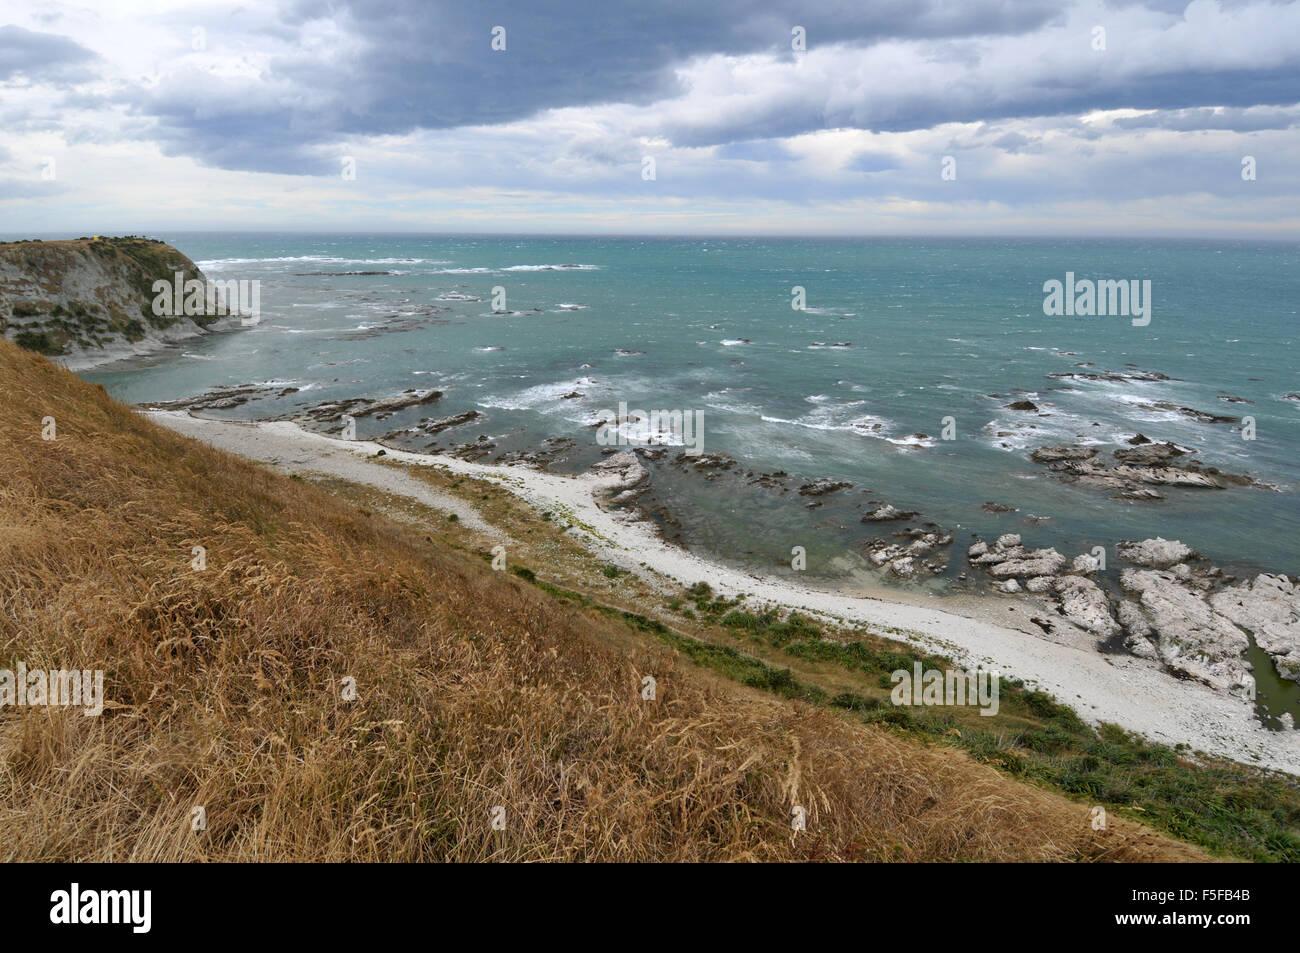 Scenic view from the Peninsula walkway, Kaikoura, South Island, New Zealand - Stock Image